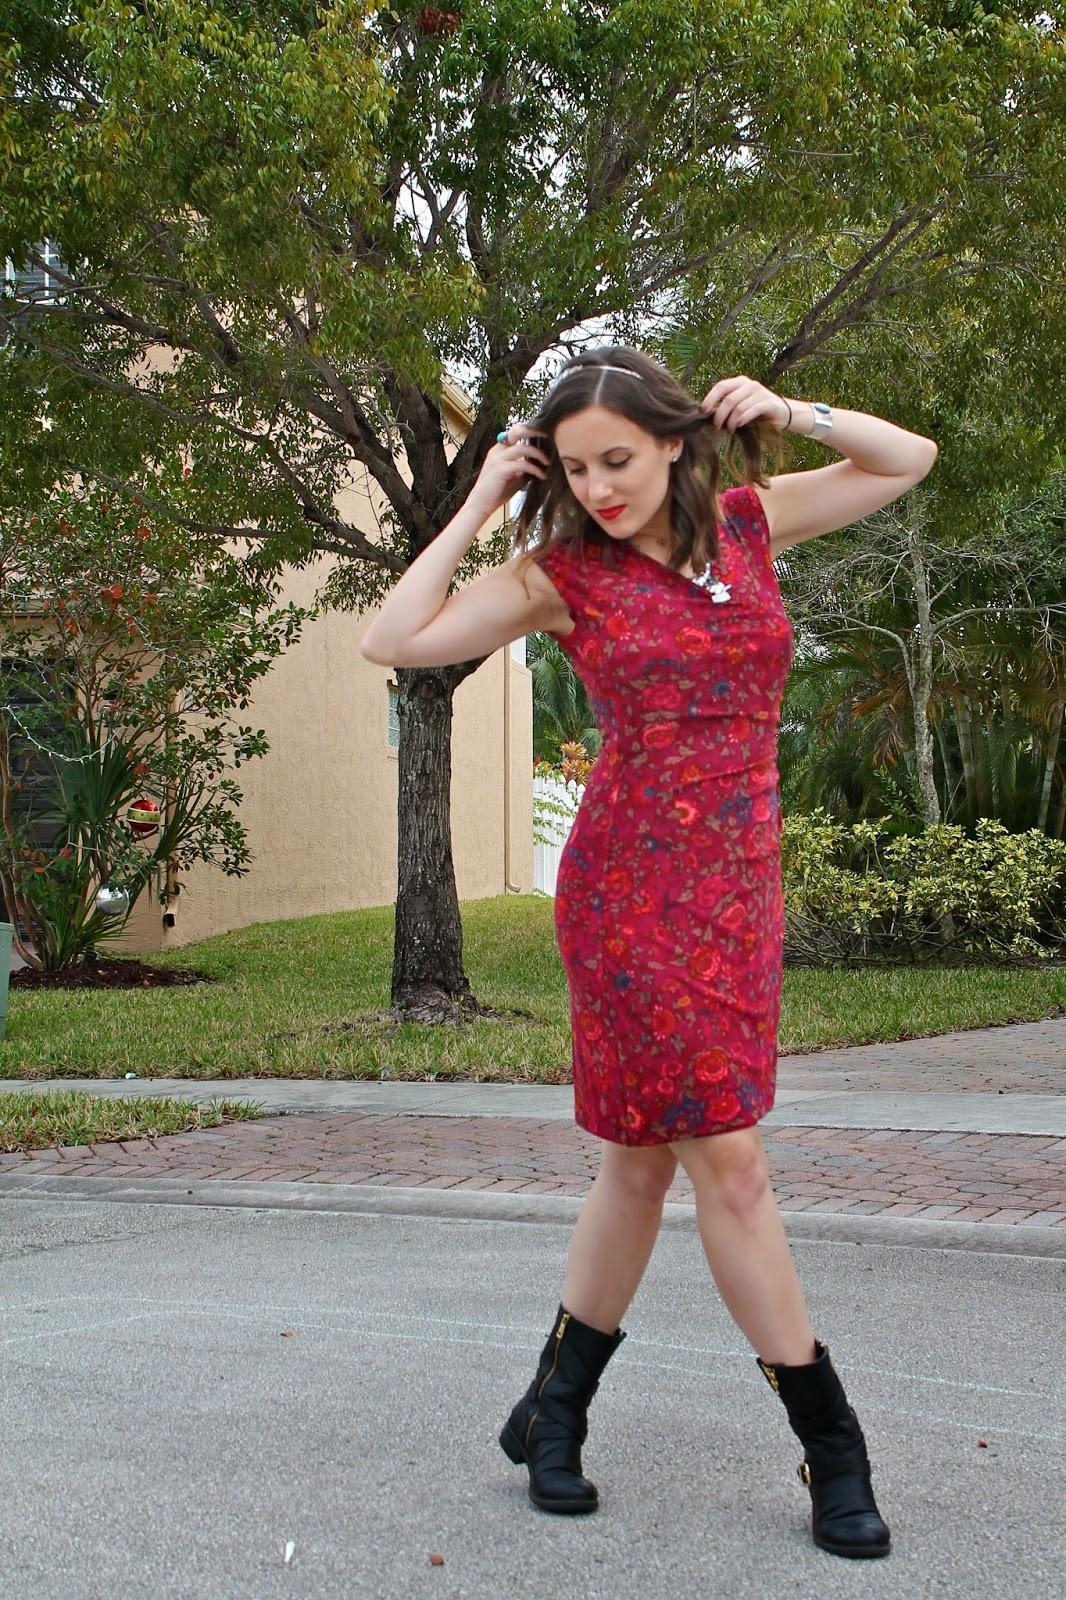 Ralph Lauren, Anthropologie, Macy's, Jessica Simpson, T.J. Maxx, style, fashion, fashion blog, style blog, ootd, holiday style